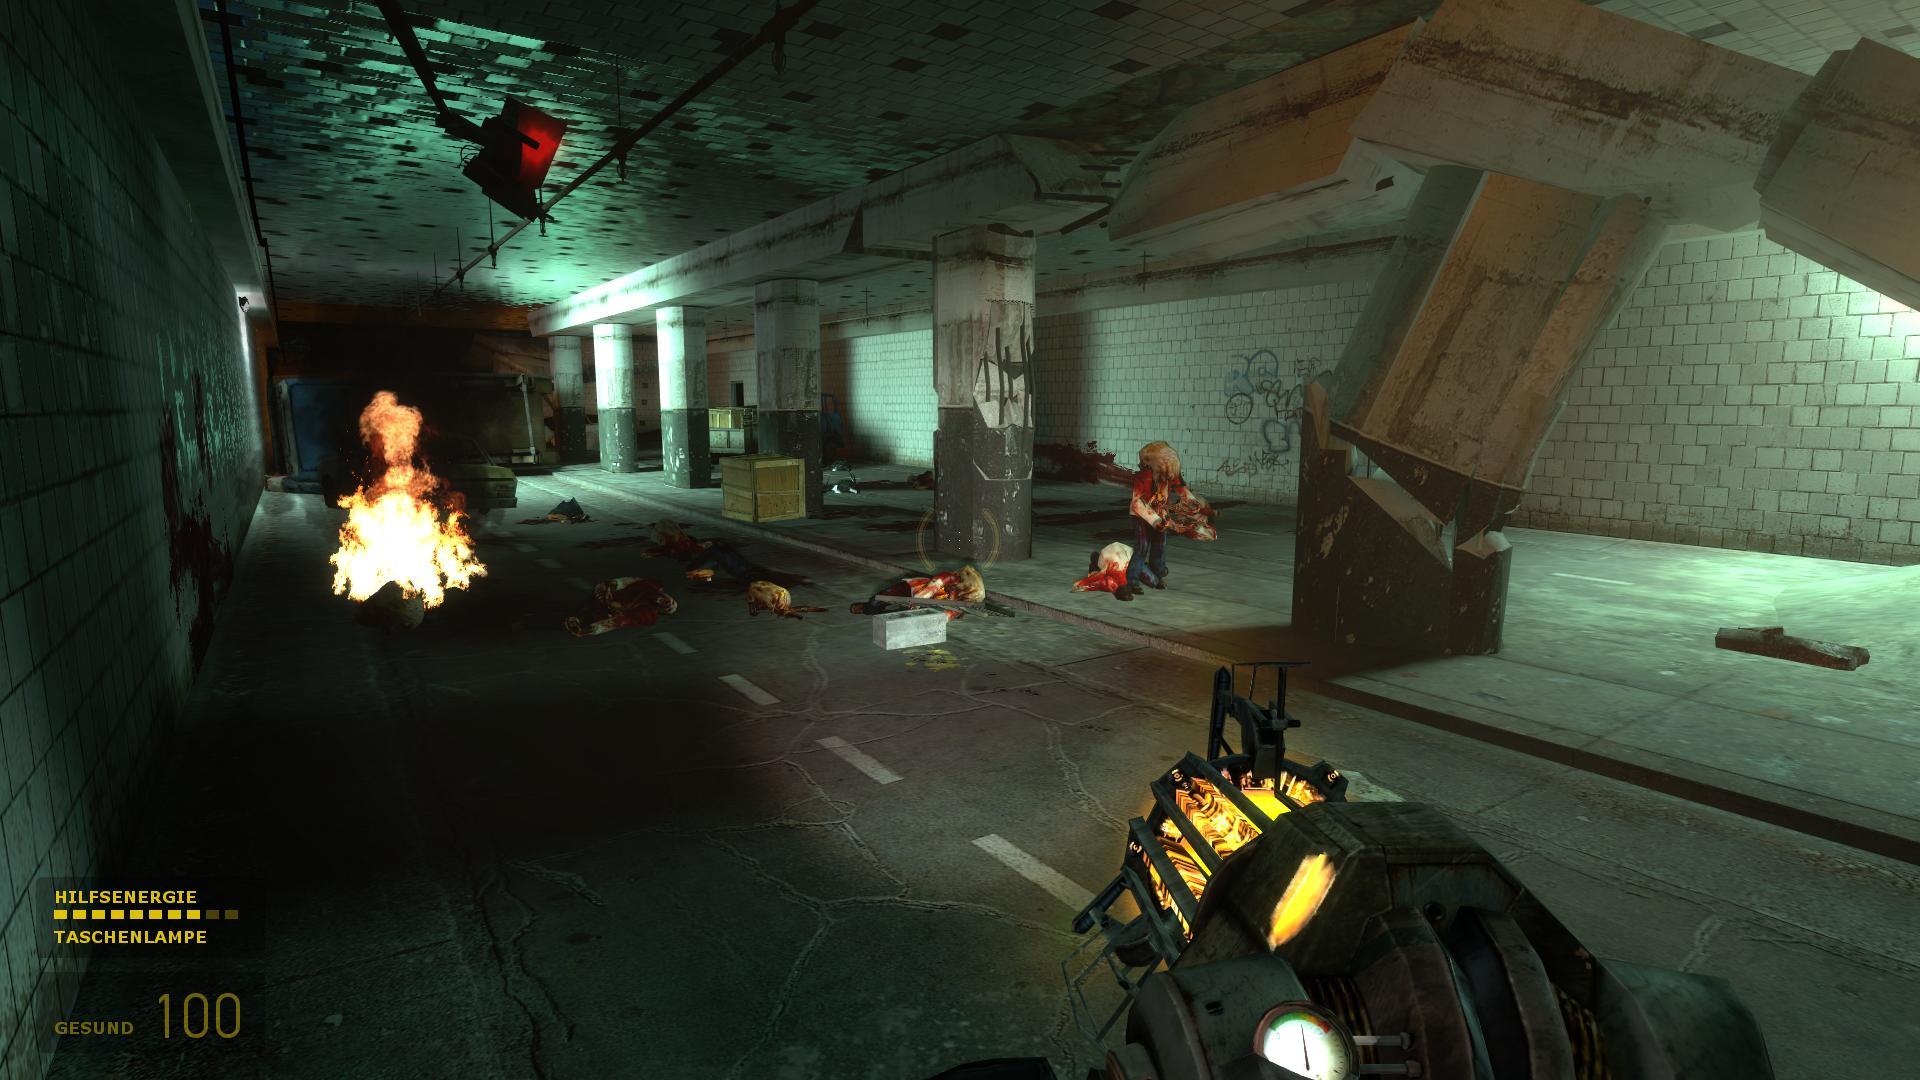 wprowadzenie do Half-Life Phet Lab (radioaktywna gra randkowa) dopasowanie horoskopu telugu